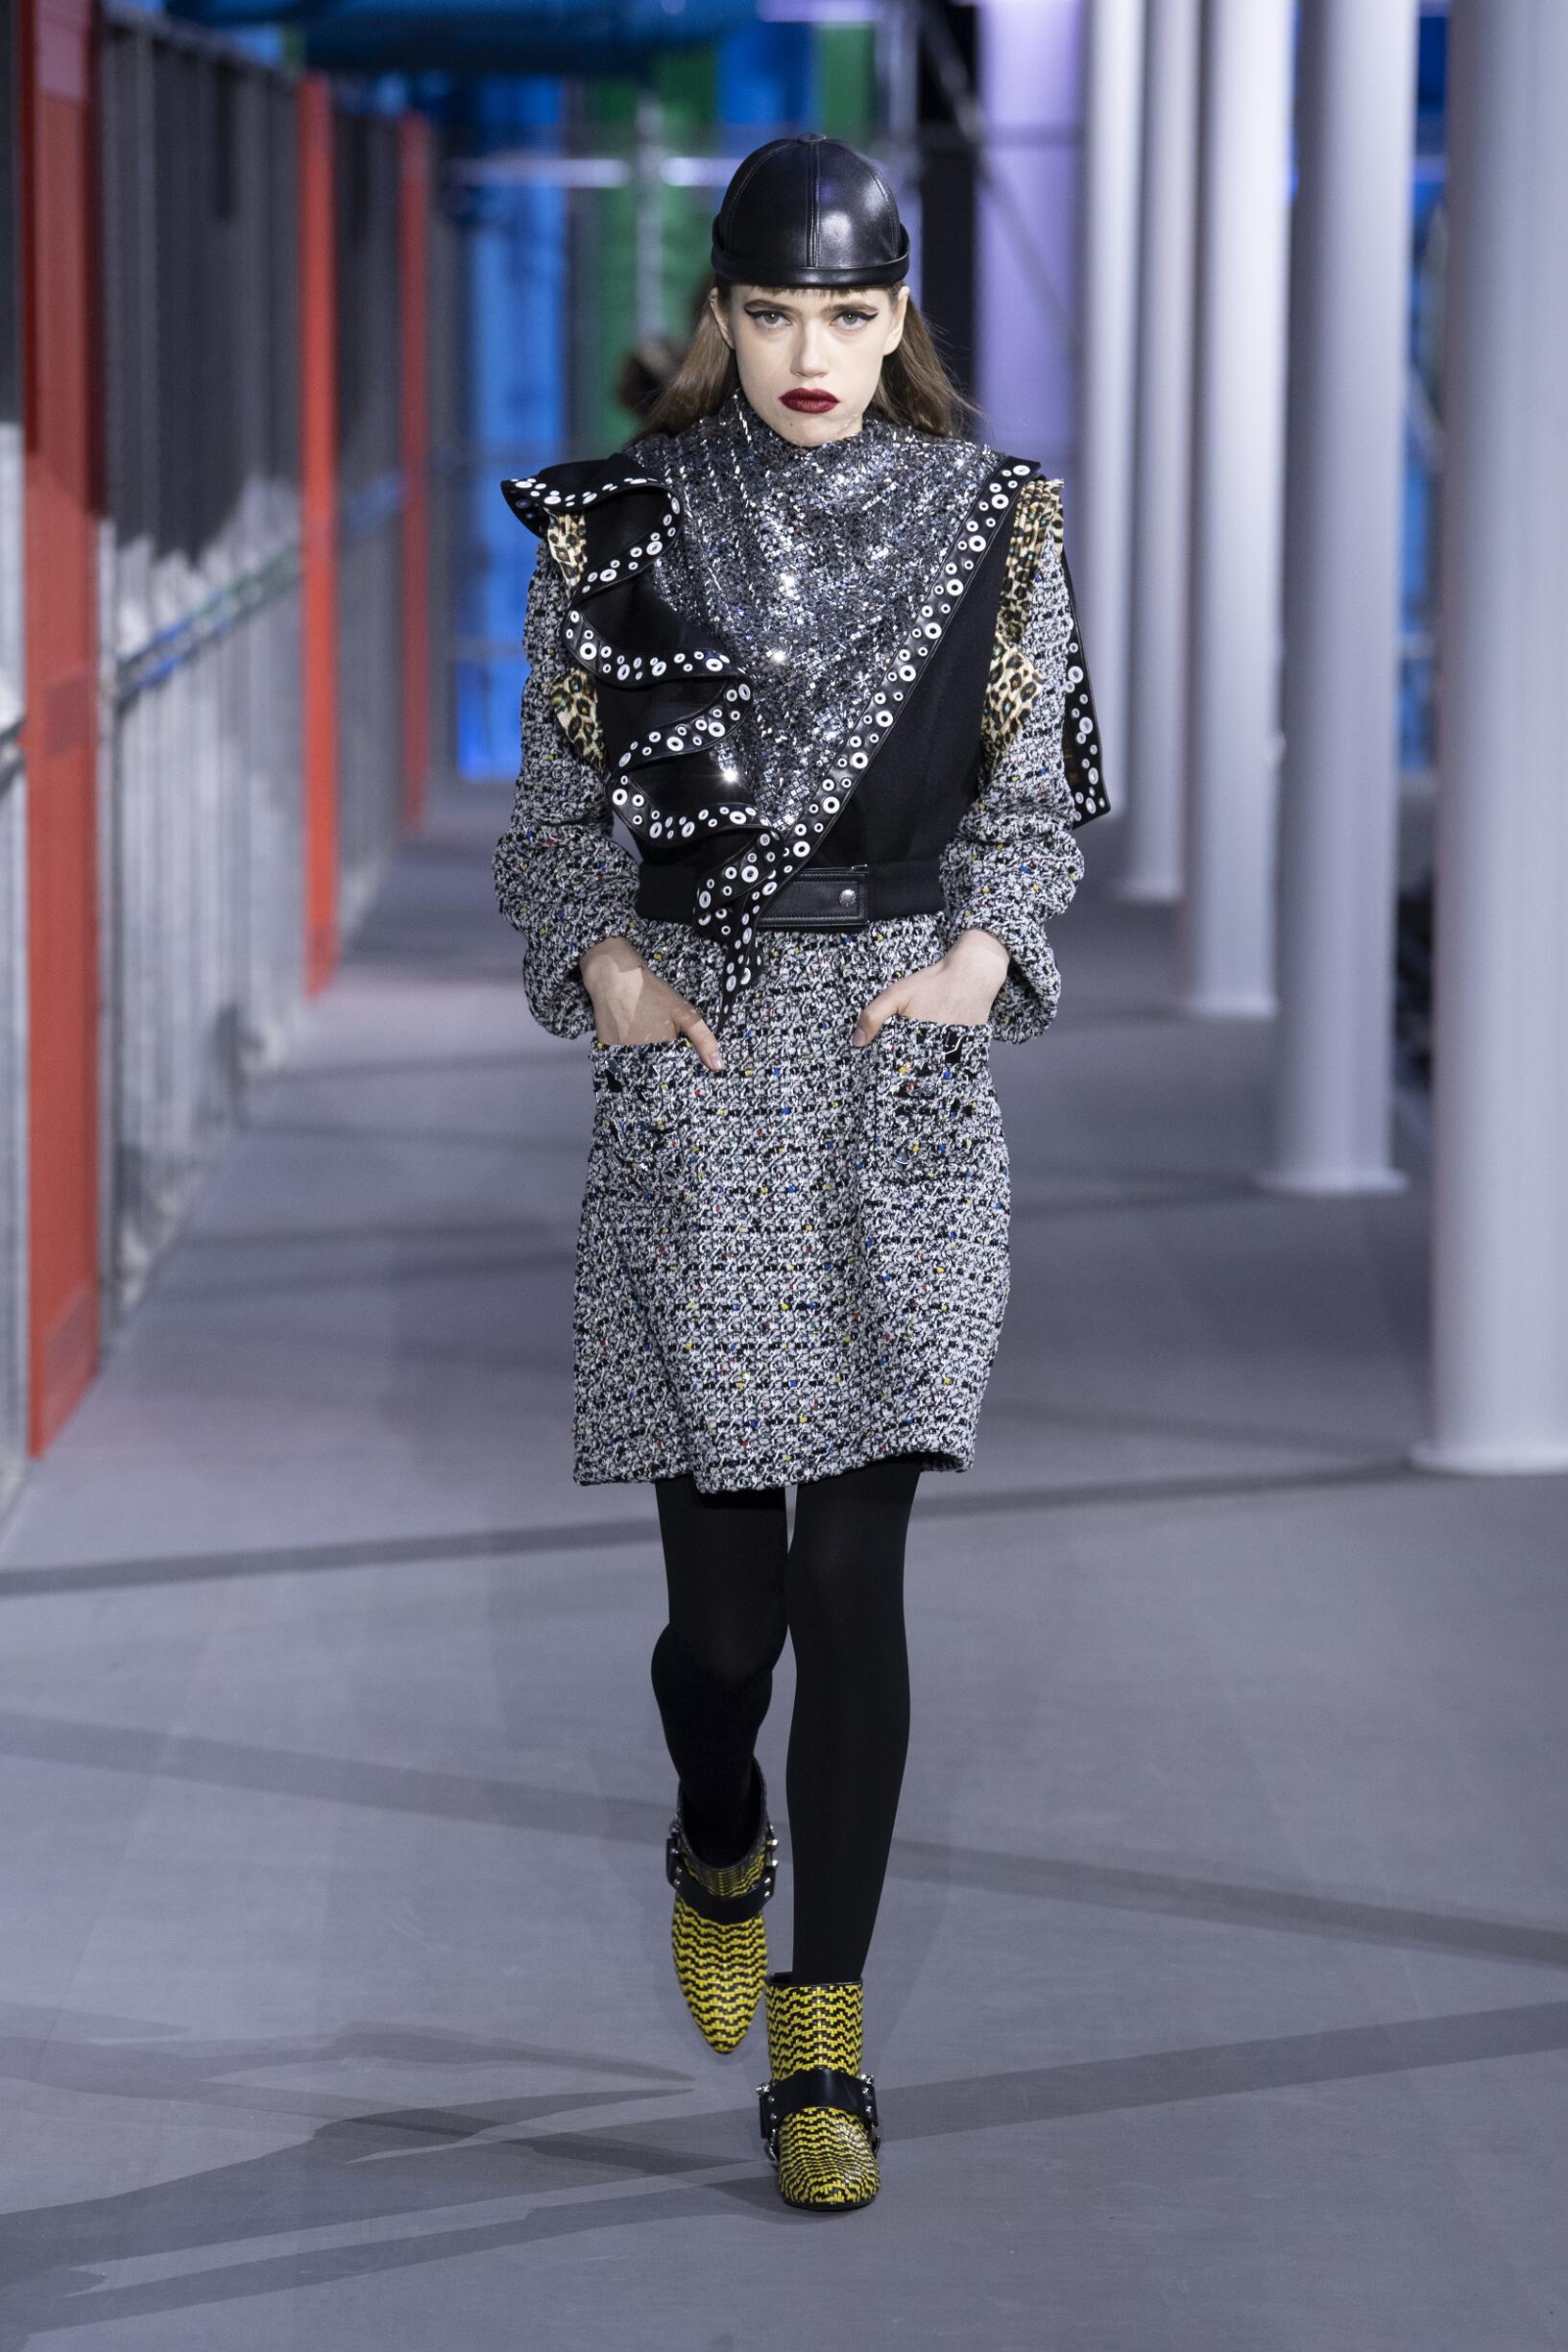 57949a58021 Louis Vuitton Fashion Show FW 2019